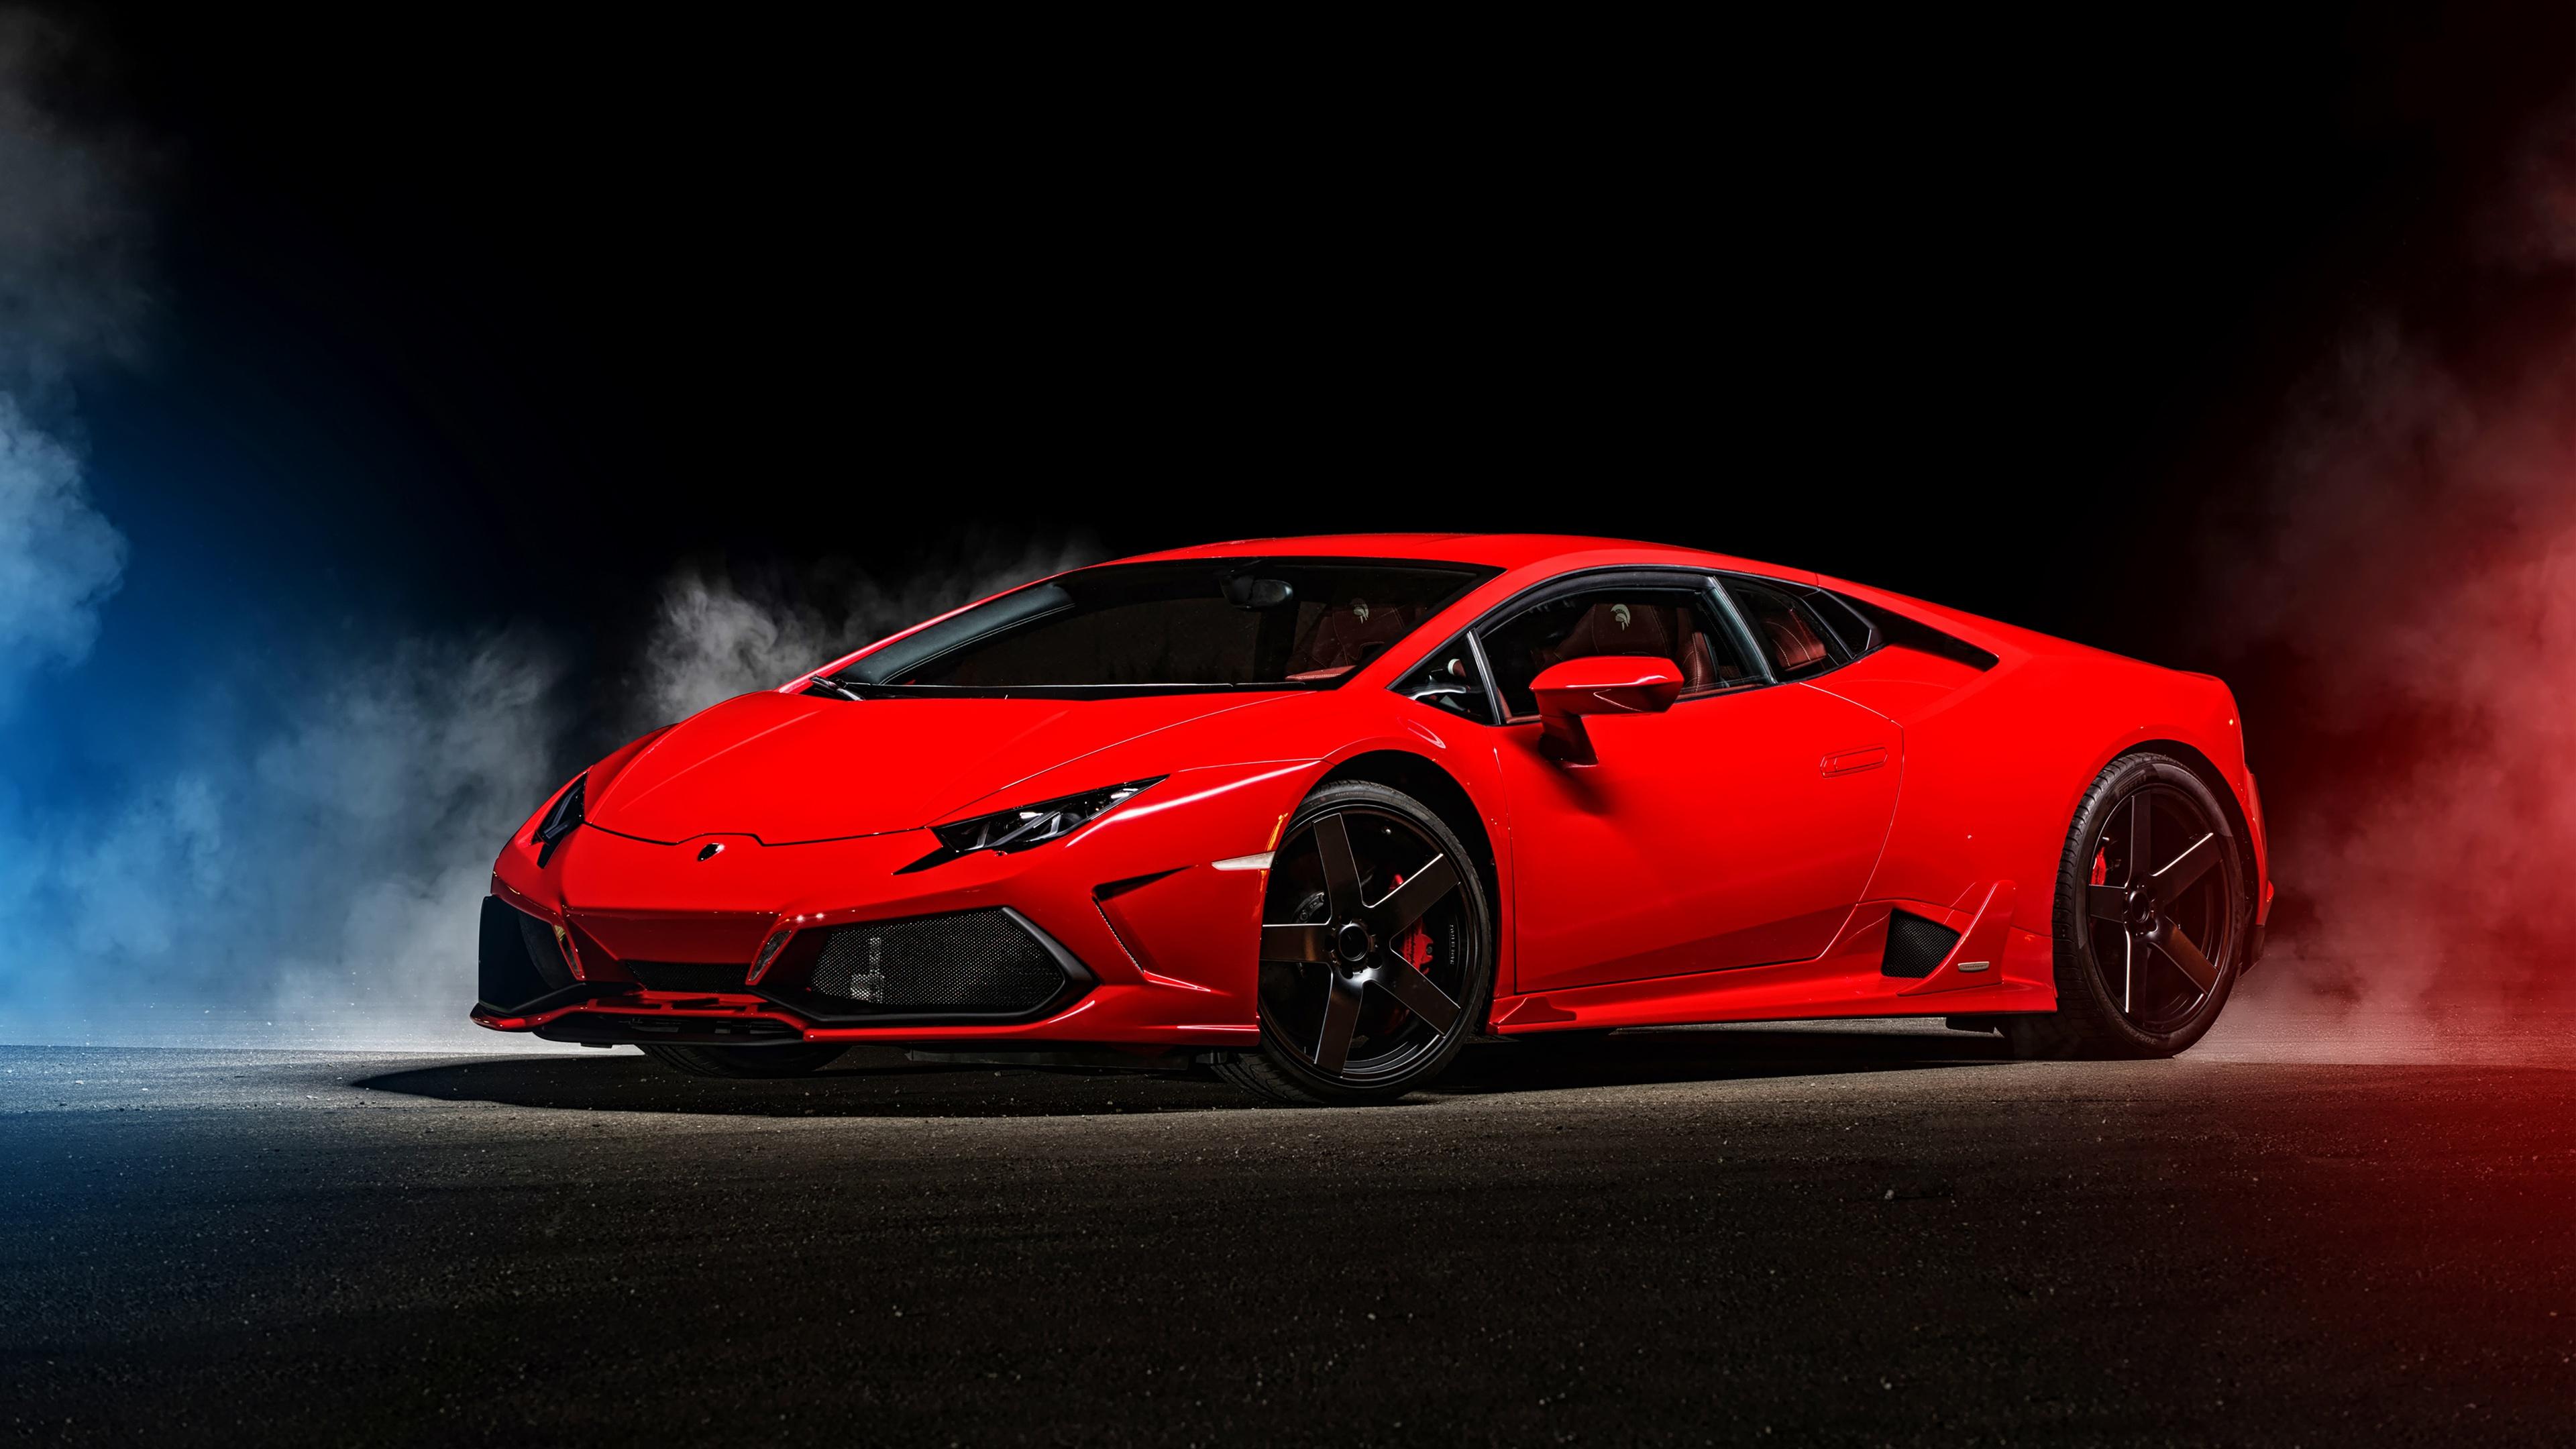 Lamborghini Huracan 4k Ultra HD Wallpaper Background Image 3840x2160